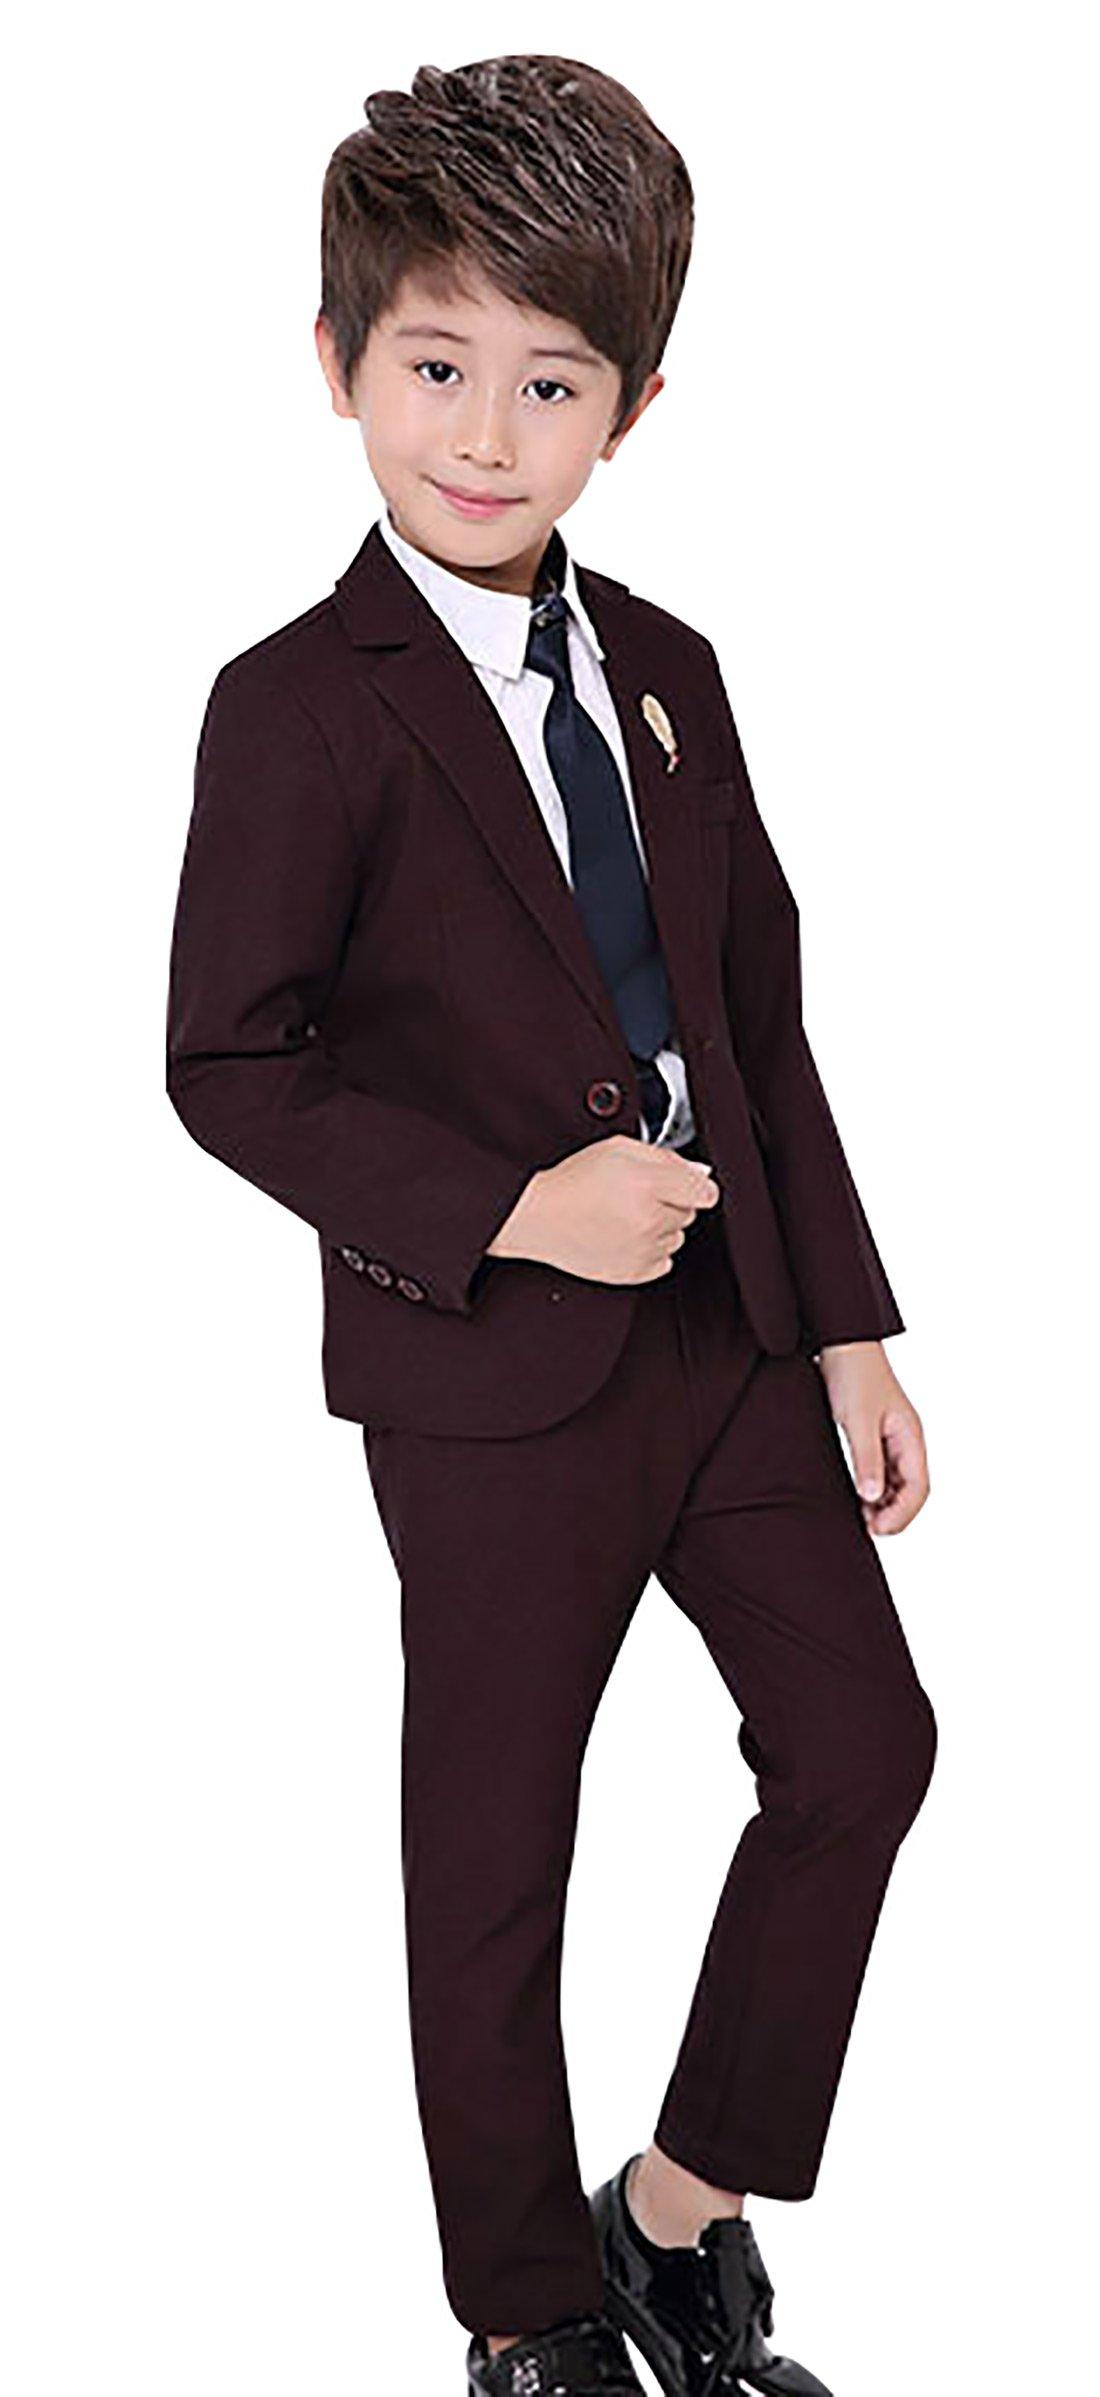 Boy Dress Tuxedo Suits Set 3 Pcs children Costumes Formal Wedding Suit Set For Party Show Dinner Red Wine 4T 110